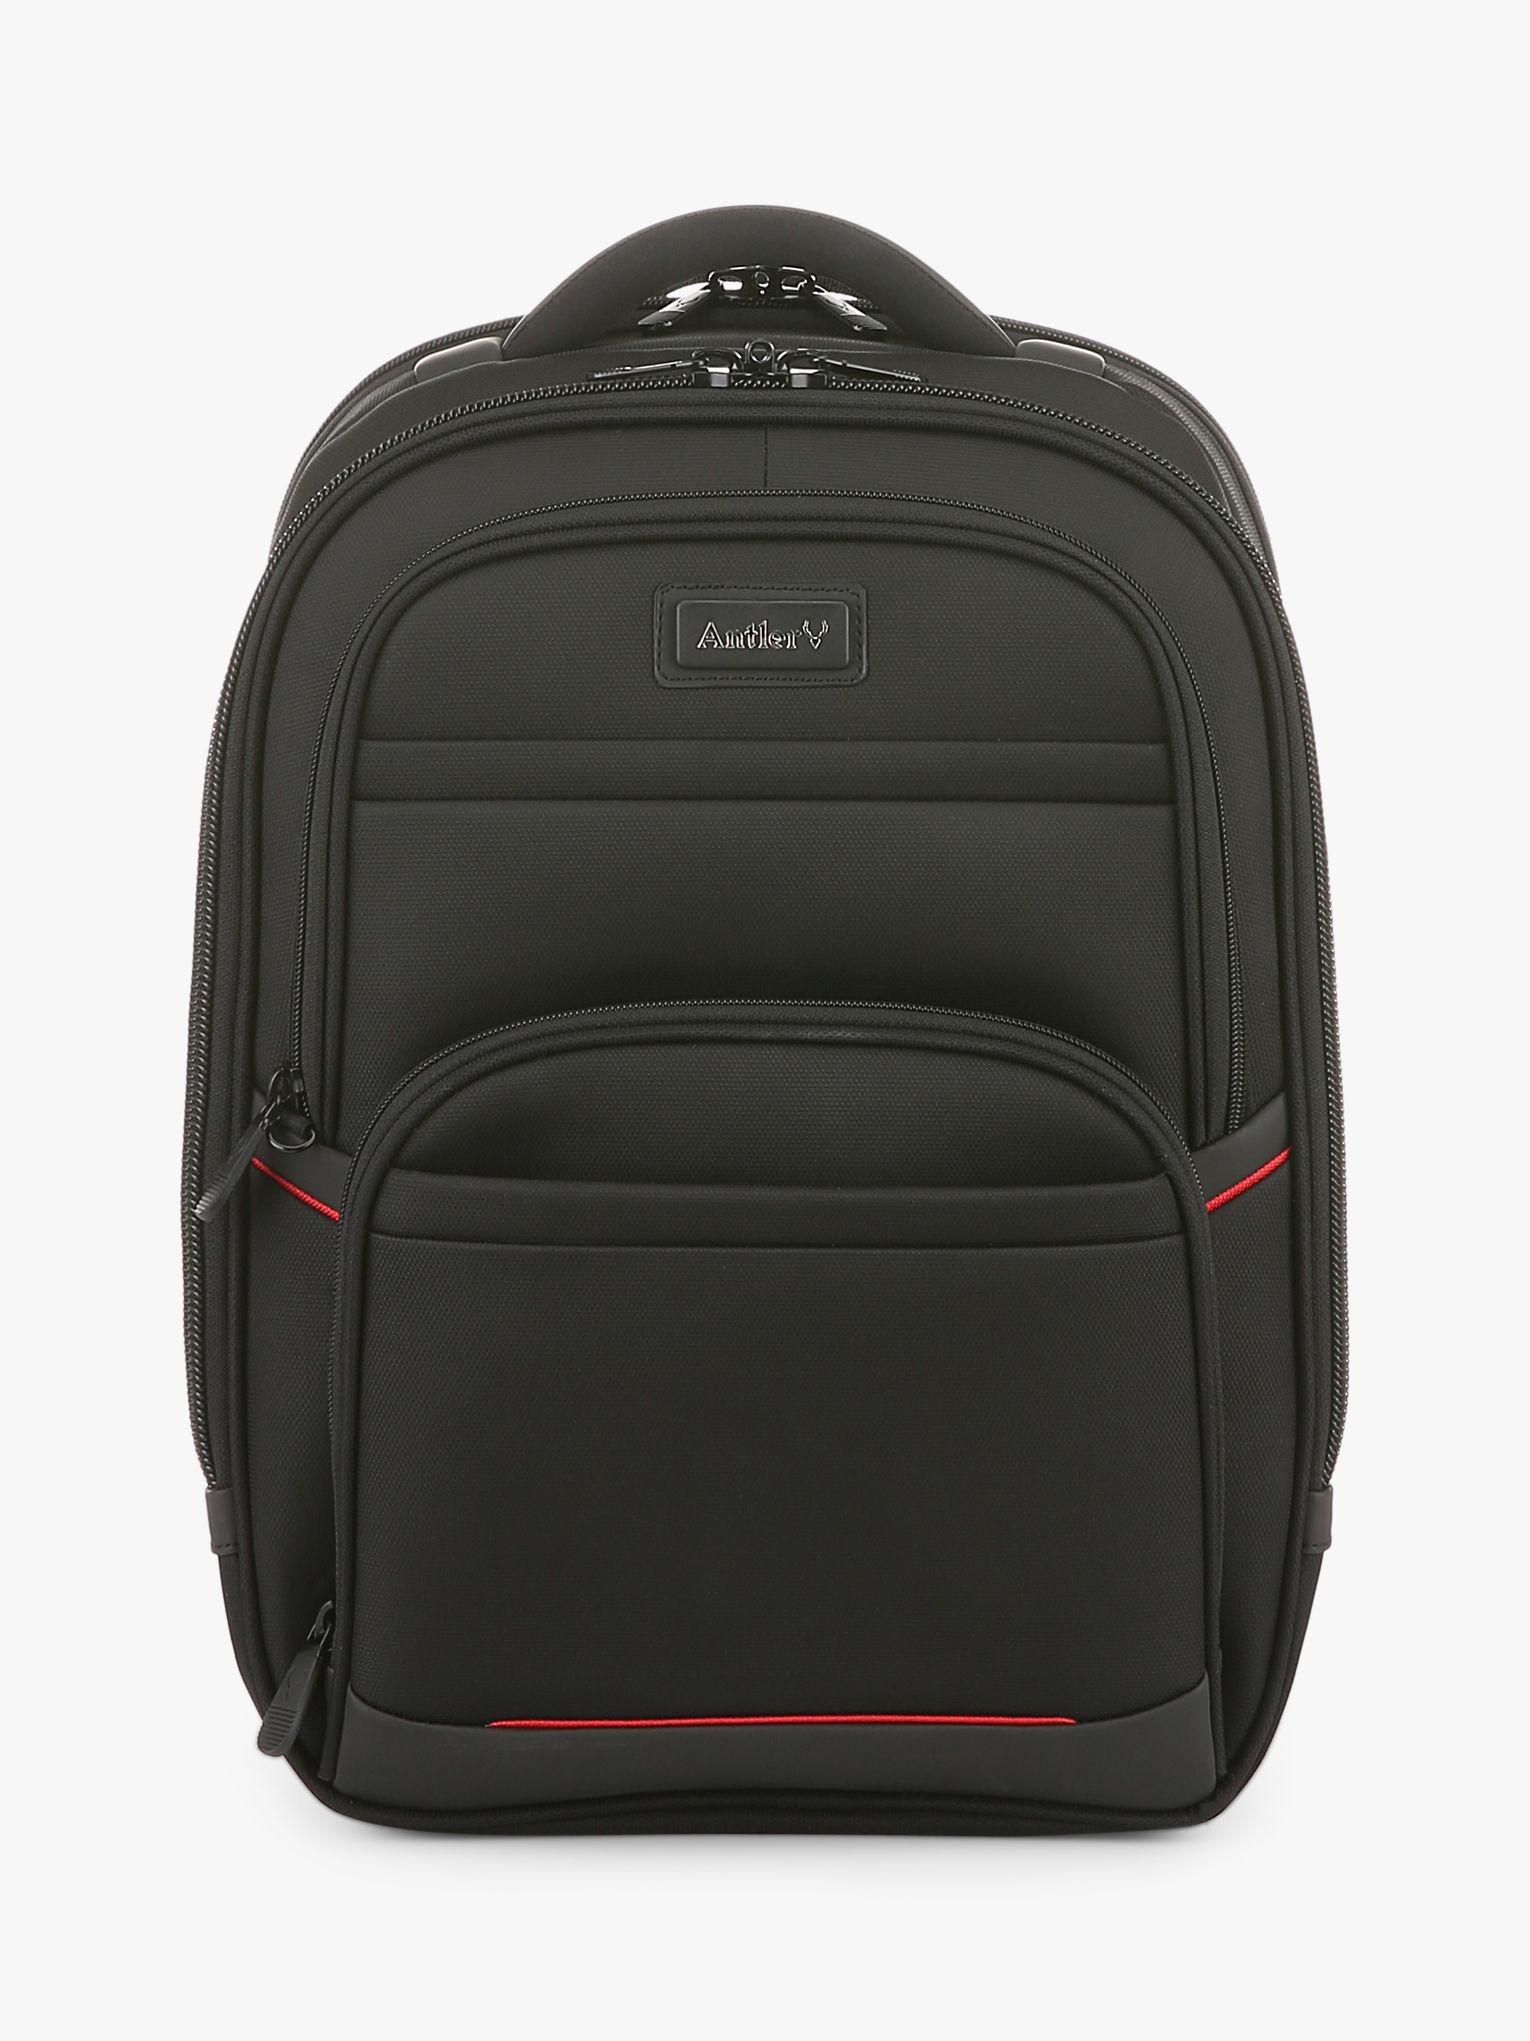 Antler Antler Atmosphere Backpack, Black